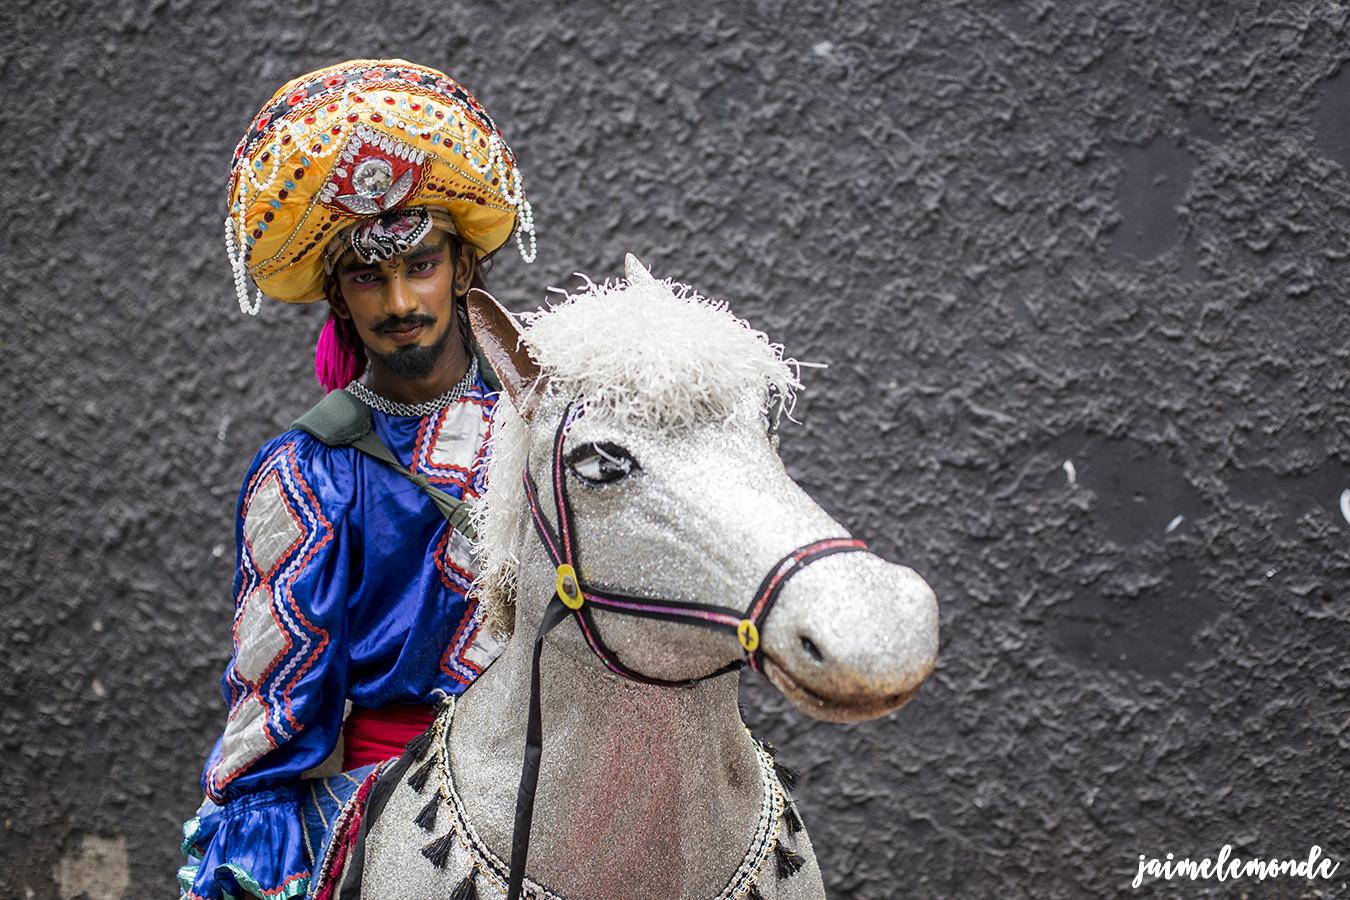 Portraits de voyage au Sri Lanka ©jaimelemonde (19)